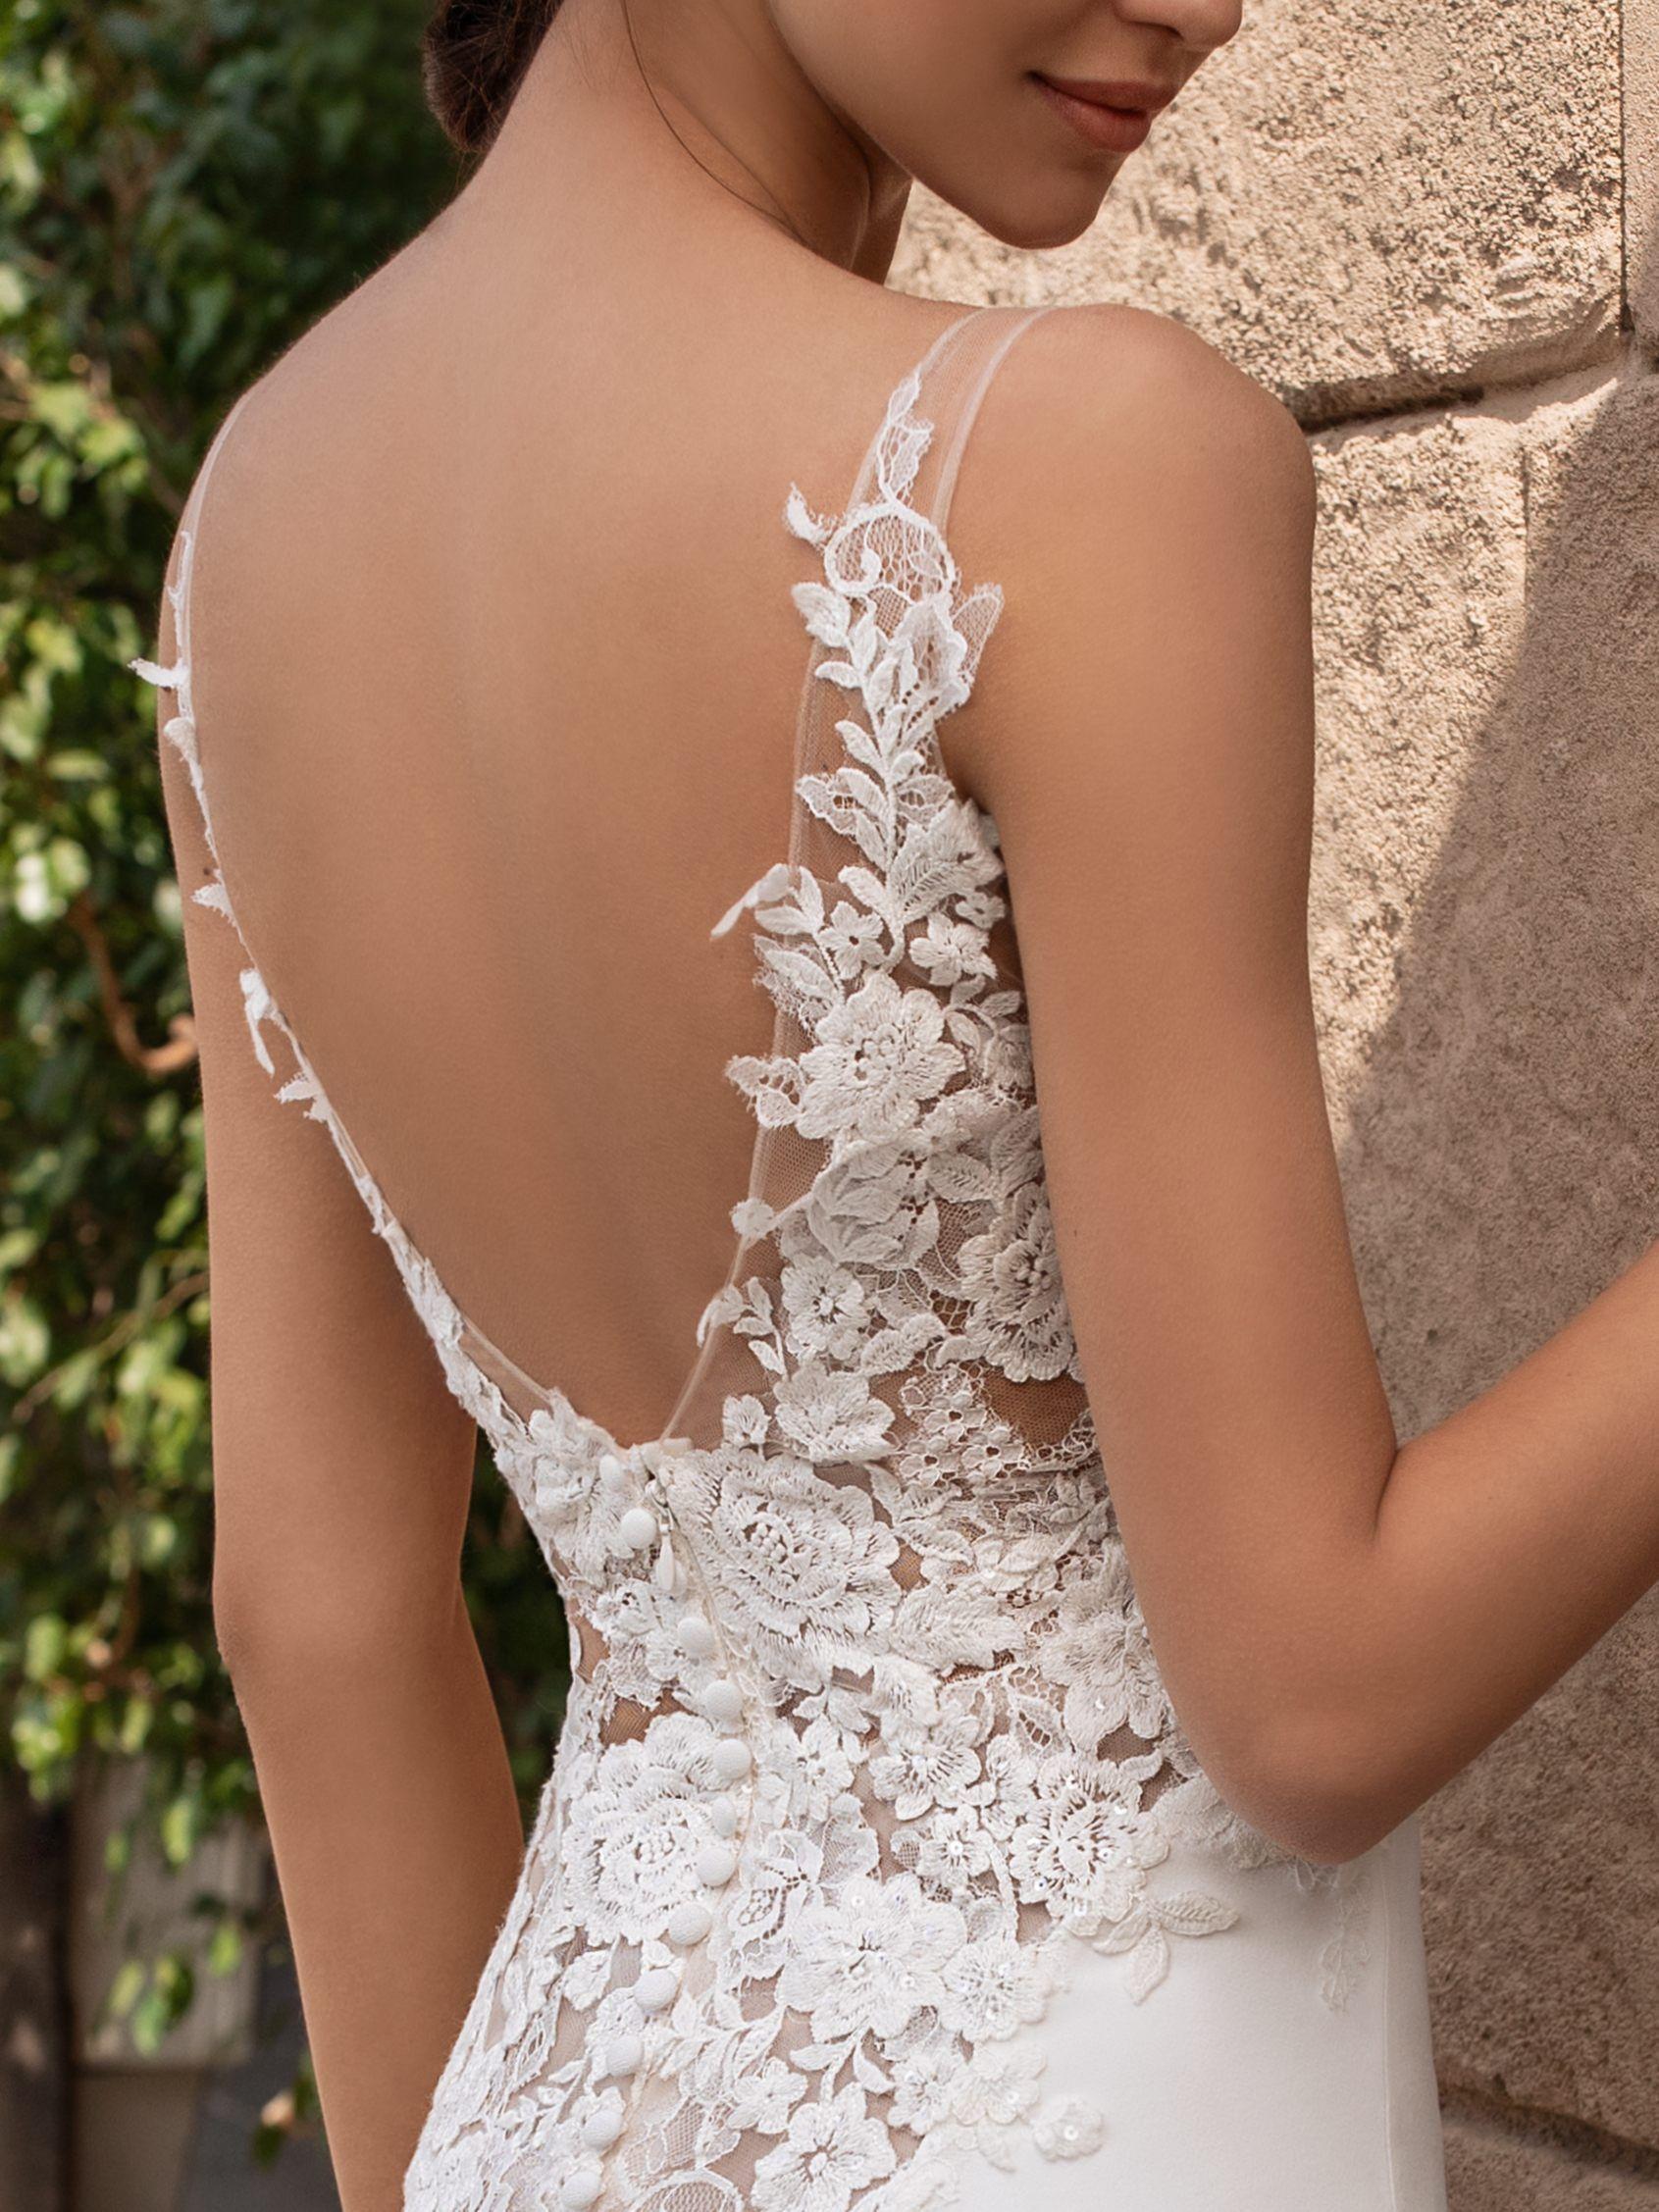 Sleeveless Wedding Dress In Crepe Fabric Pronovias Online Wedding Dress Crepe Wedding Dress Wedding Dresses